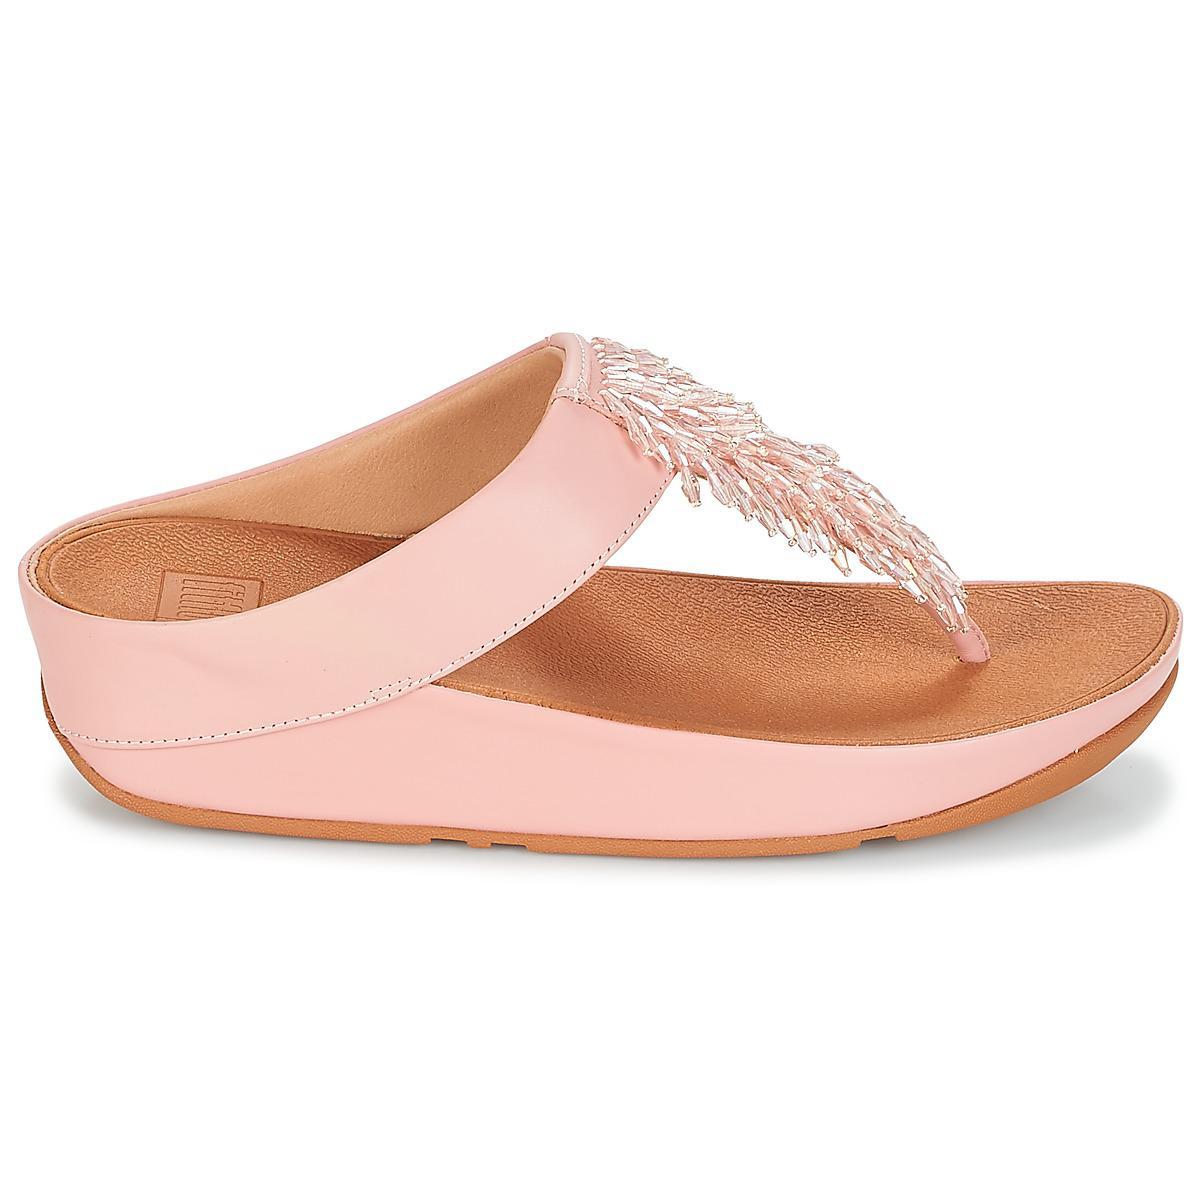 cef79f7c08d9e Fitflop - Cha-cha Toe-thong Sandals Crystal Women s Flip Flops   Sandals (.  View fullscreen